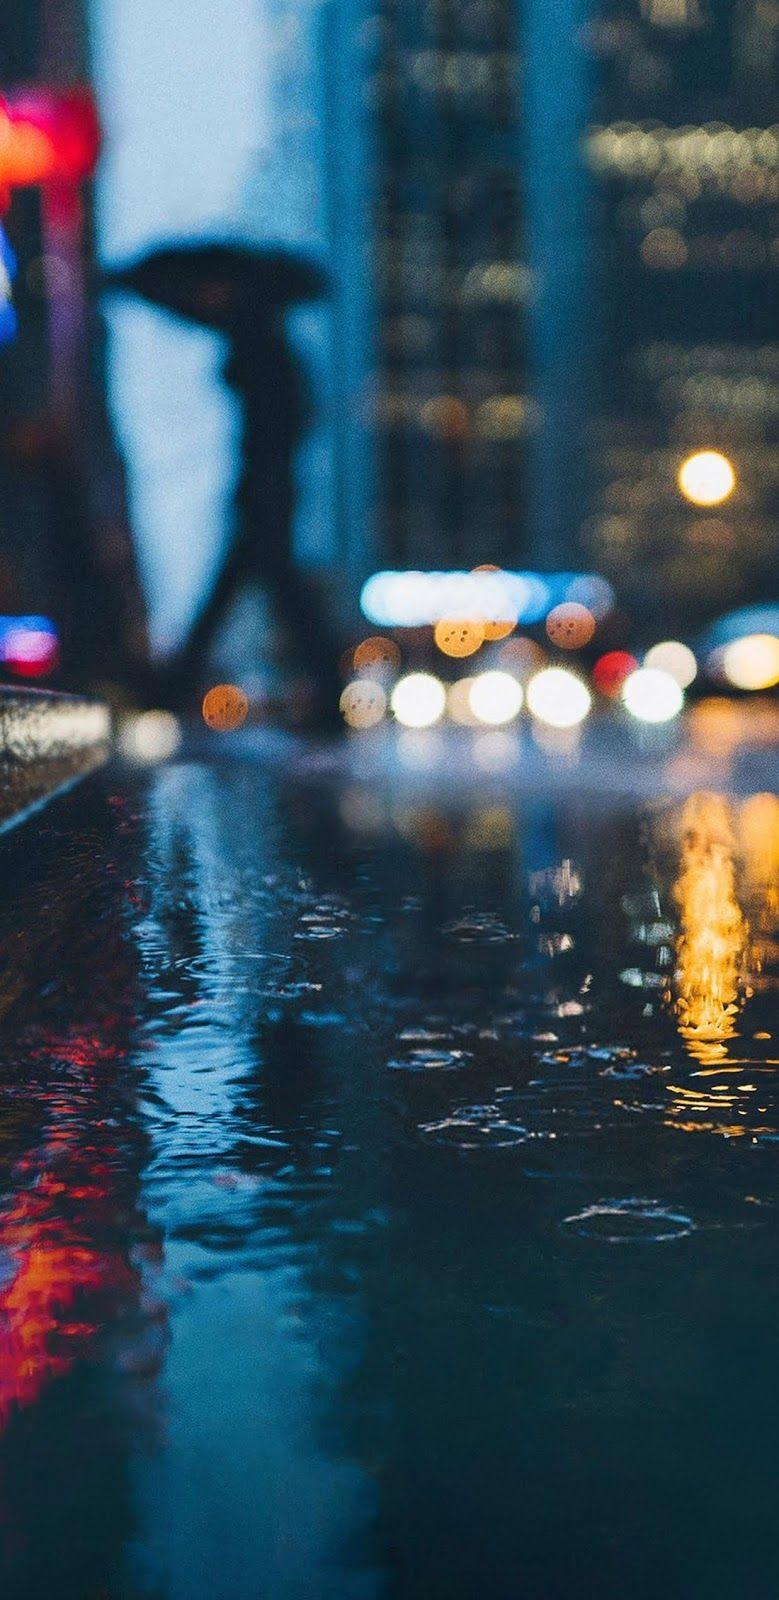 Rainy Night Mobile Wallpaper Google Pixel Wallpaper Rain Wallpapers Iphone Wallpaper Rain